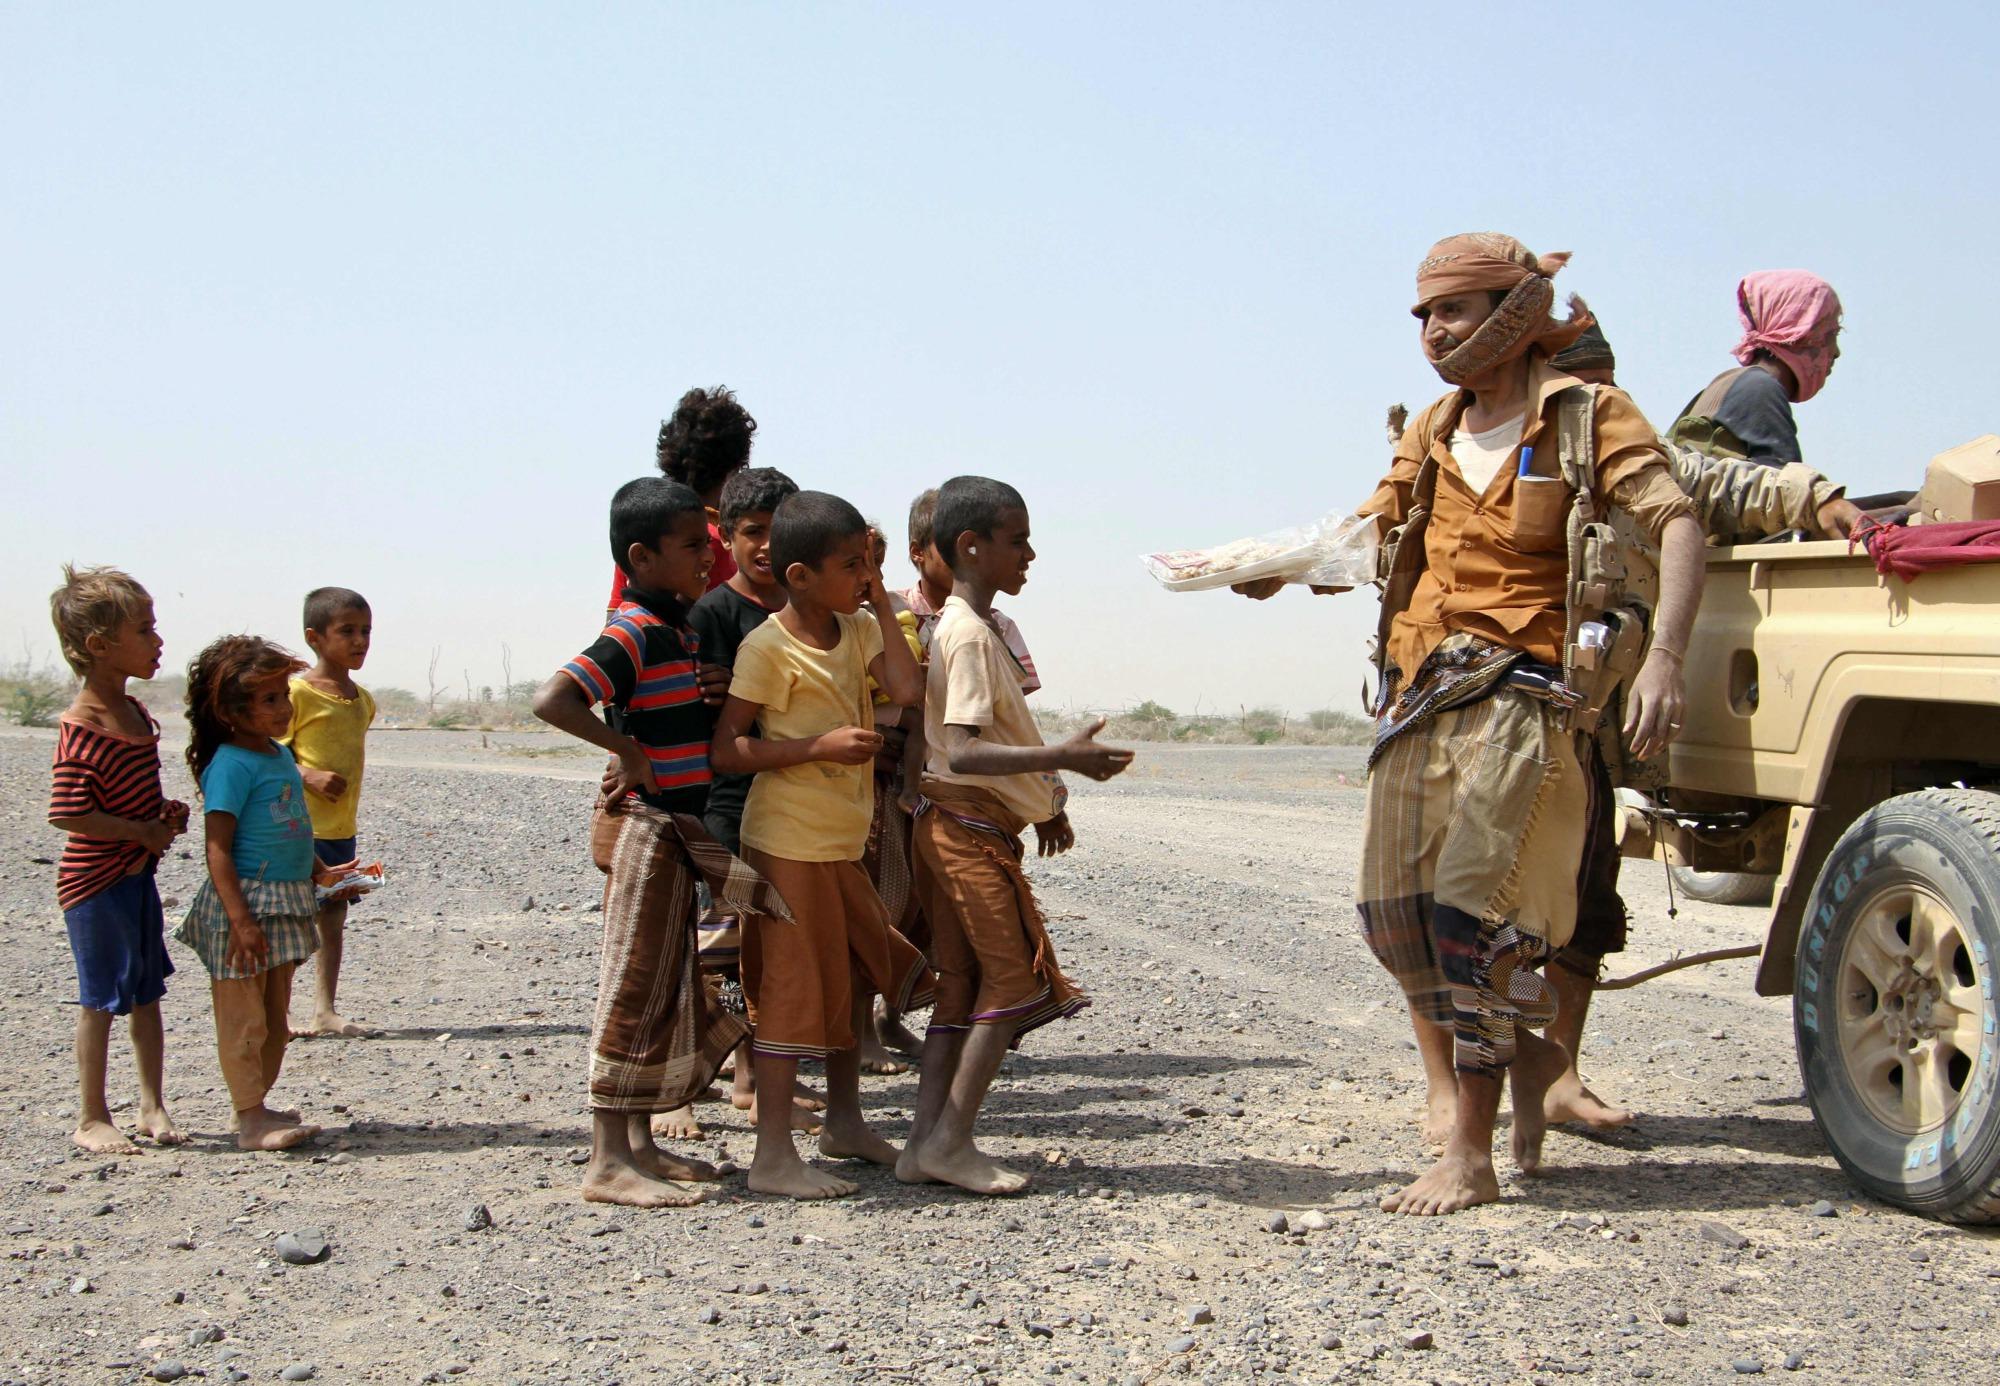 bambini yemen fame